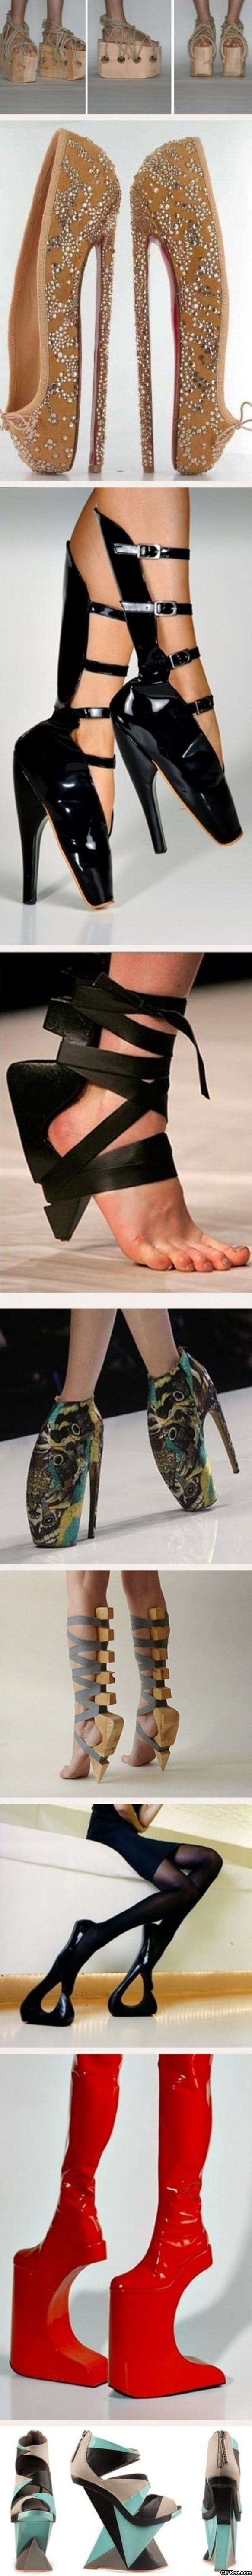 insane-high-heels